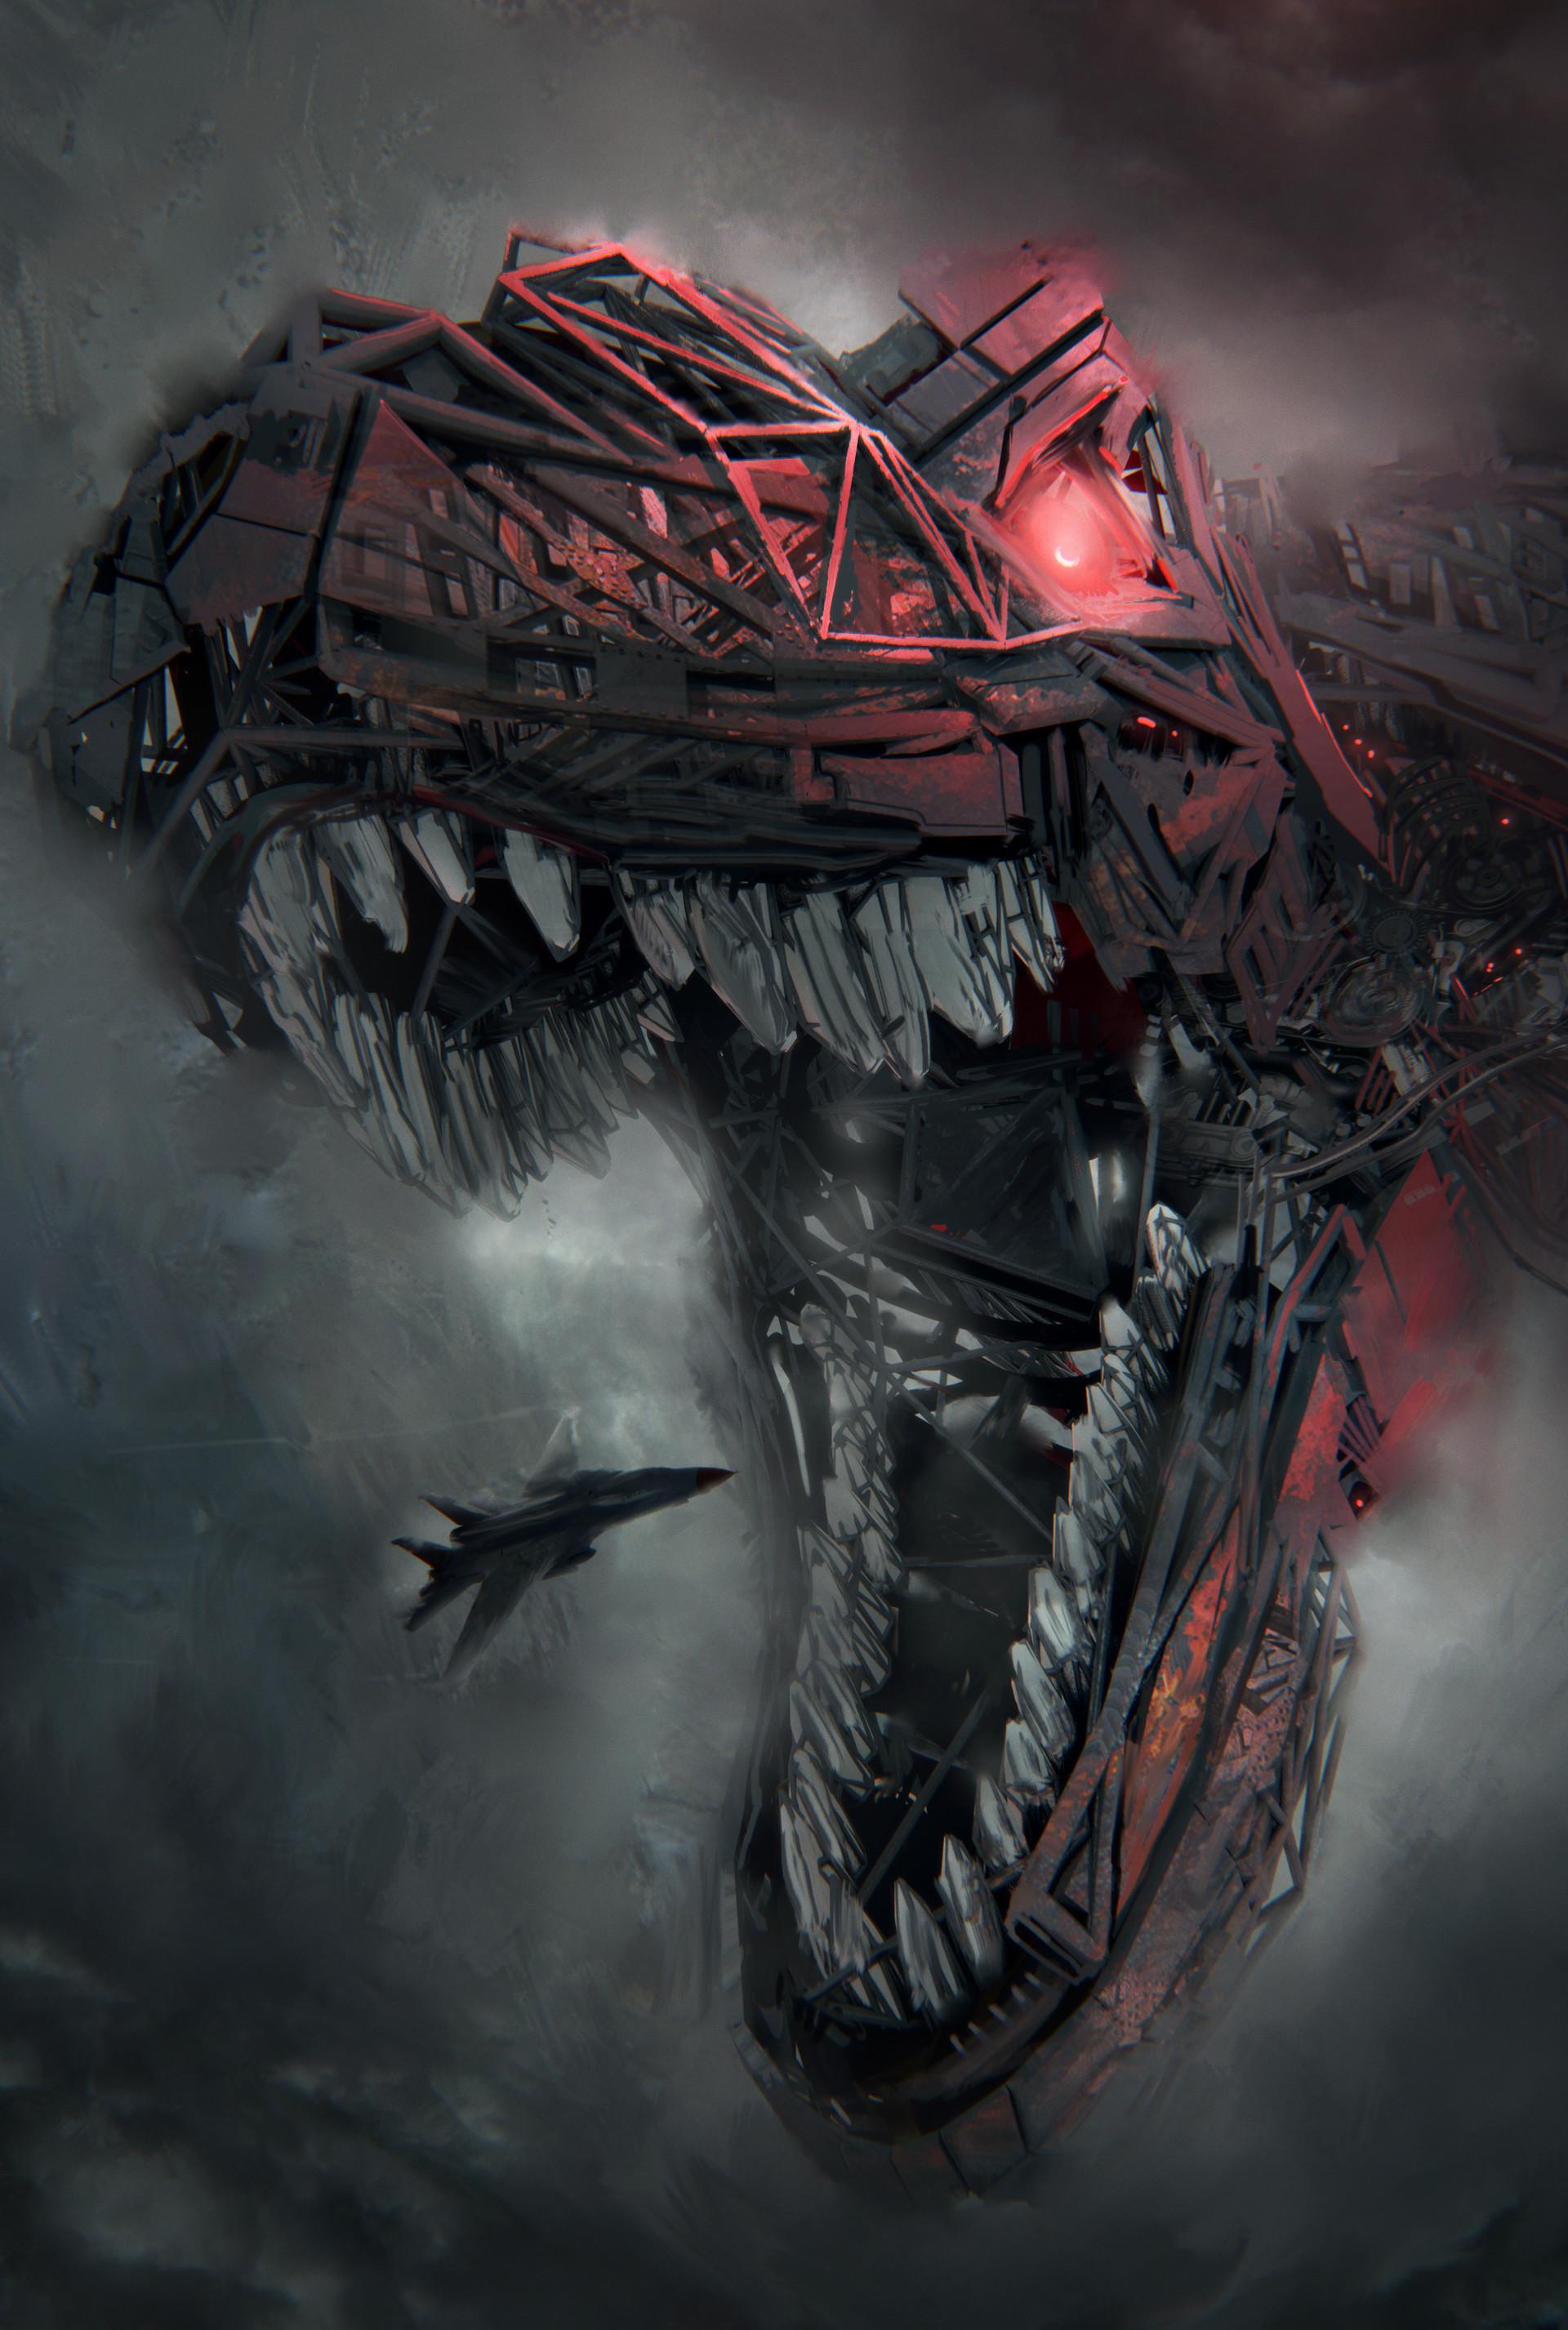 Leon tukker dinosaur0015